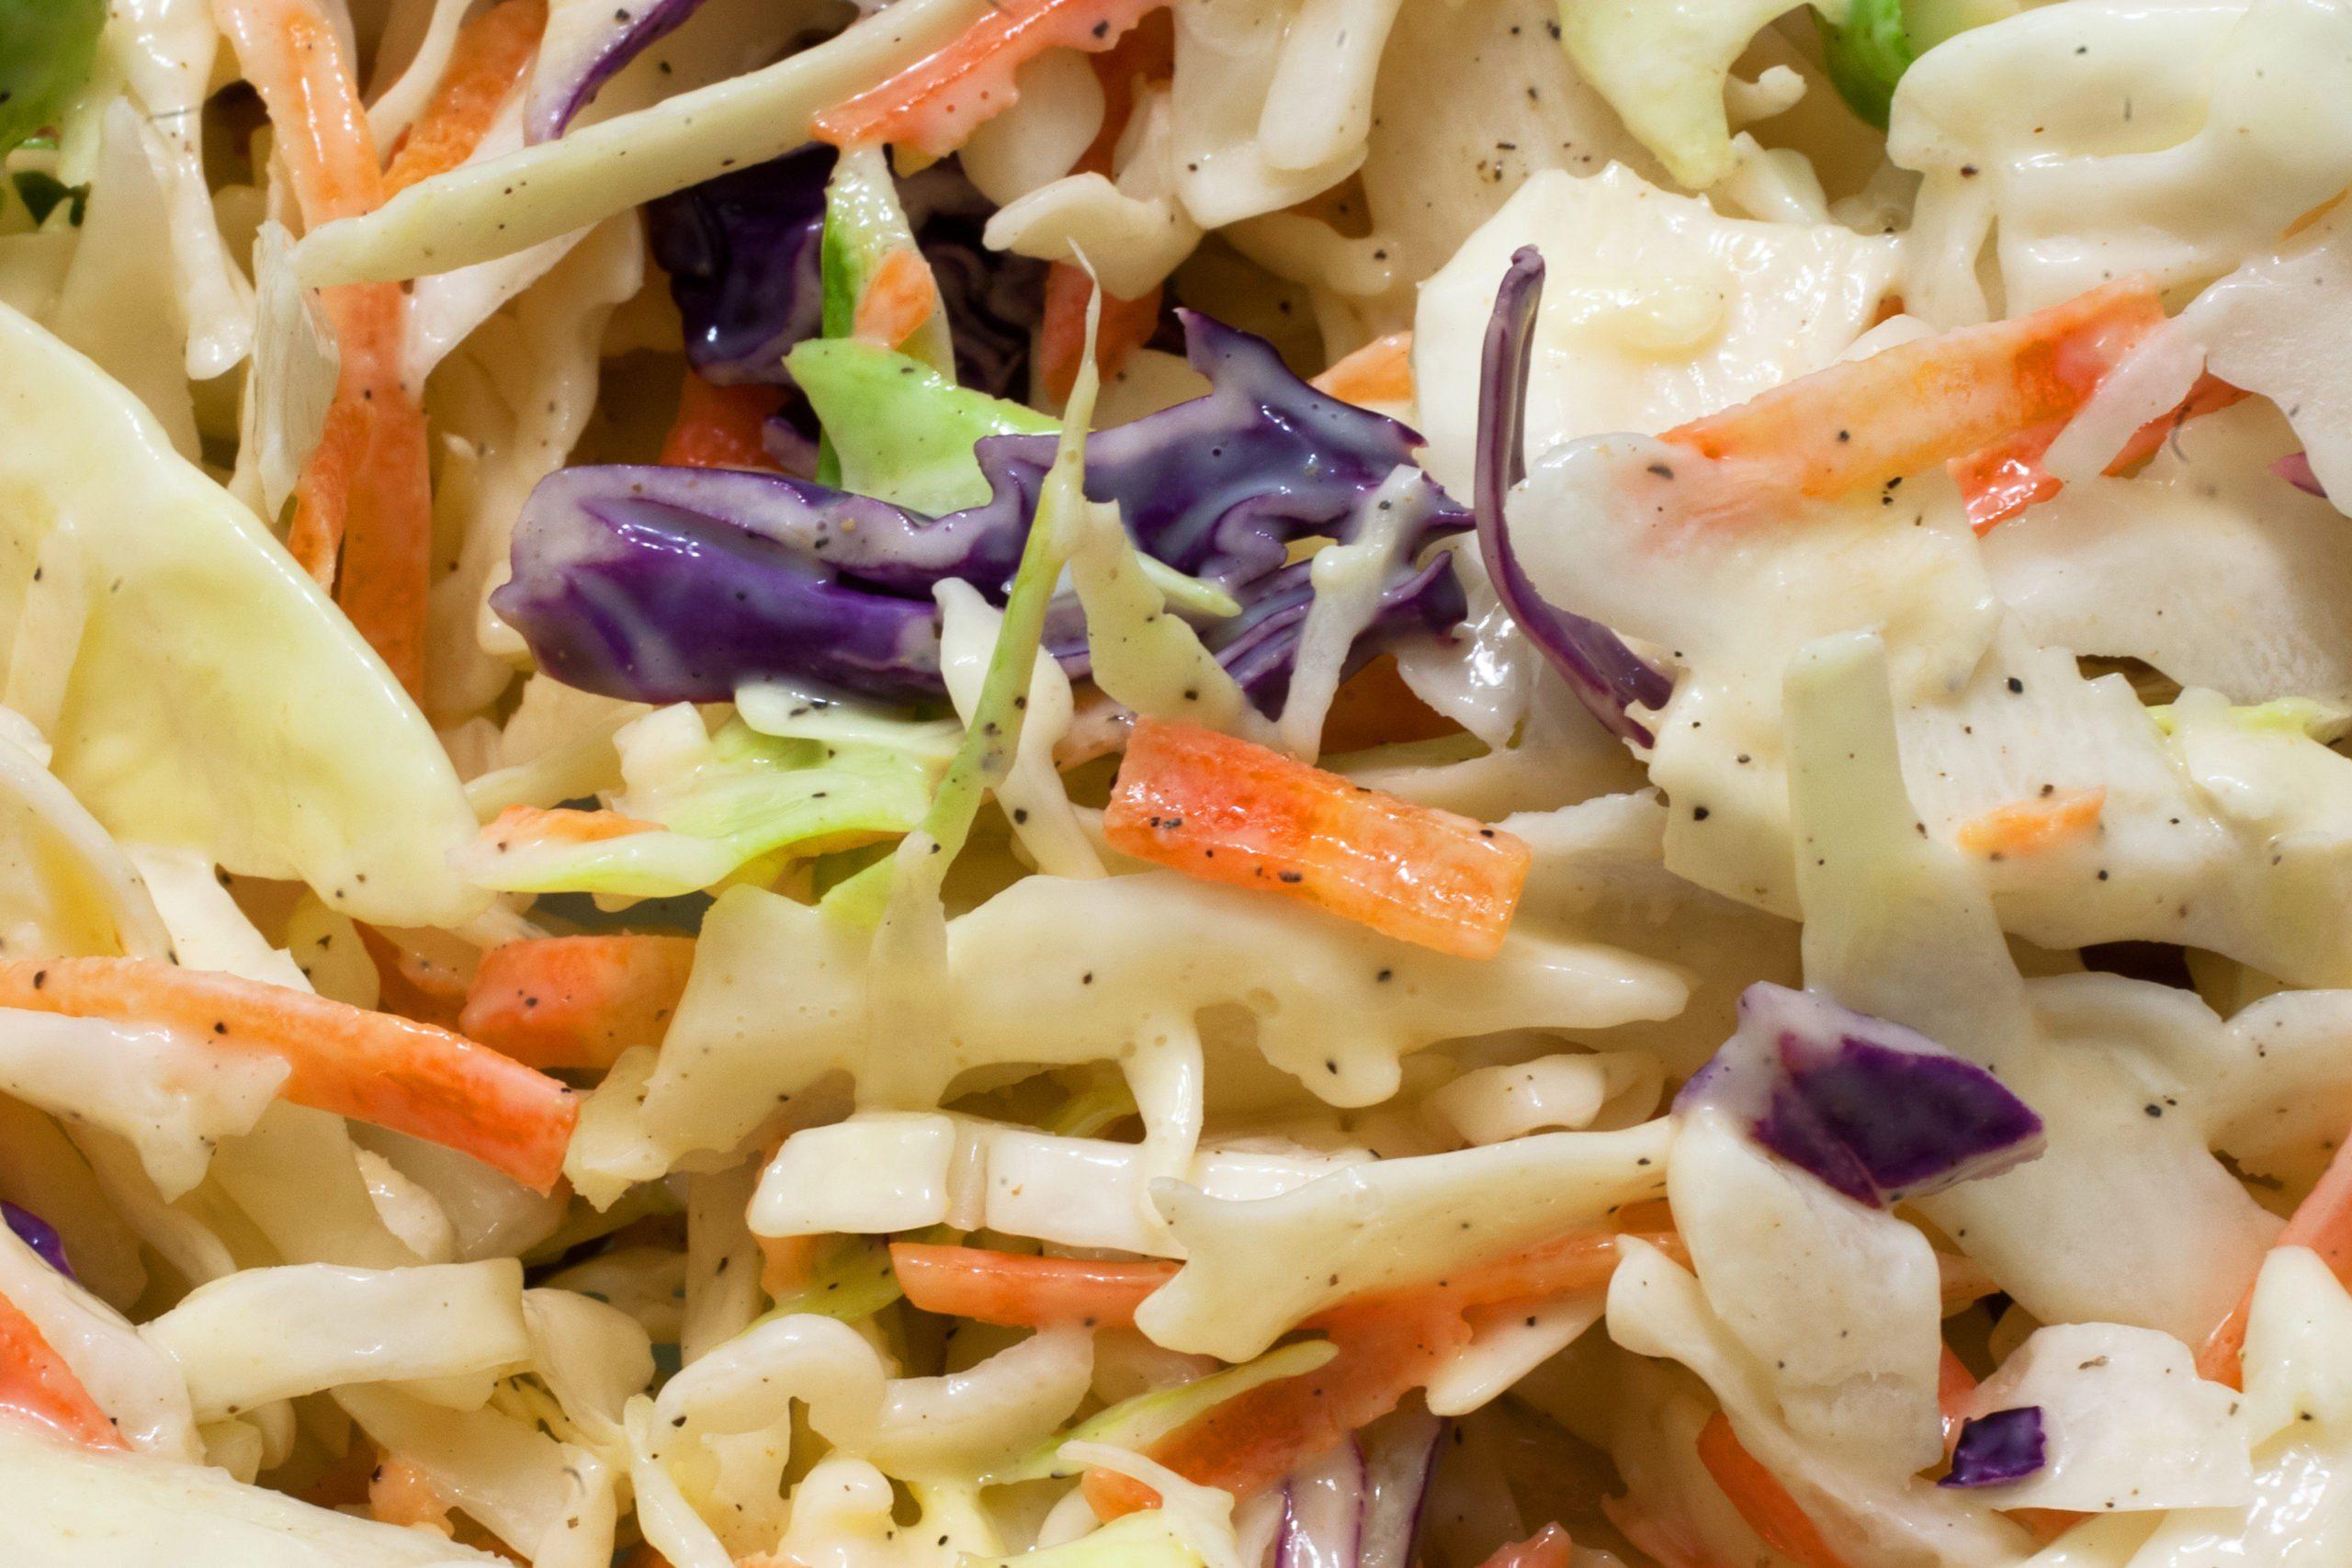 healthier grilling ideas | salad cabbage coleslaw macro food background